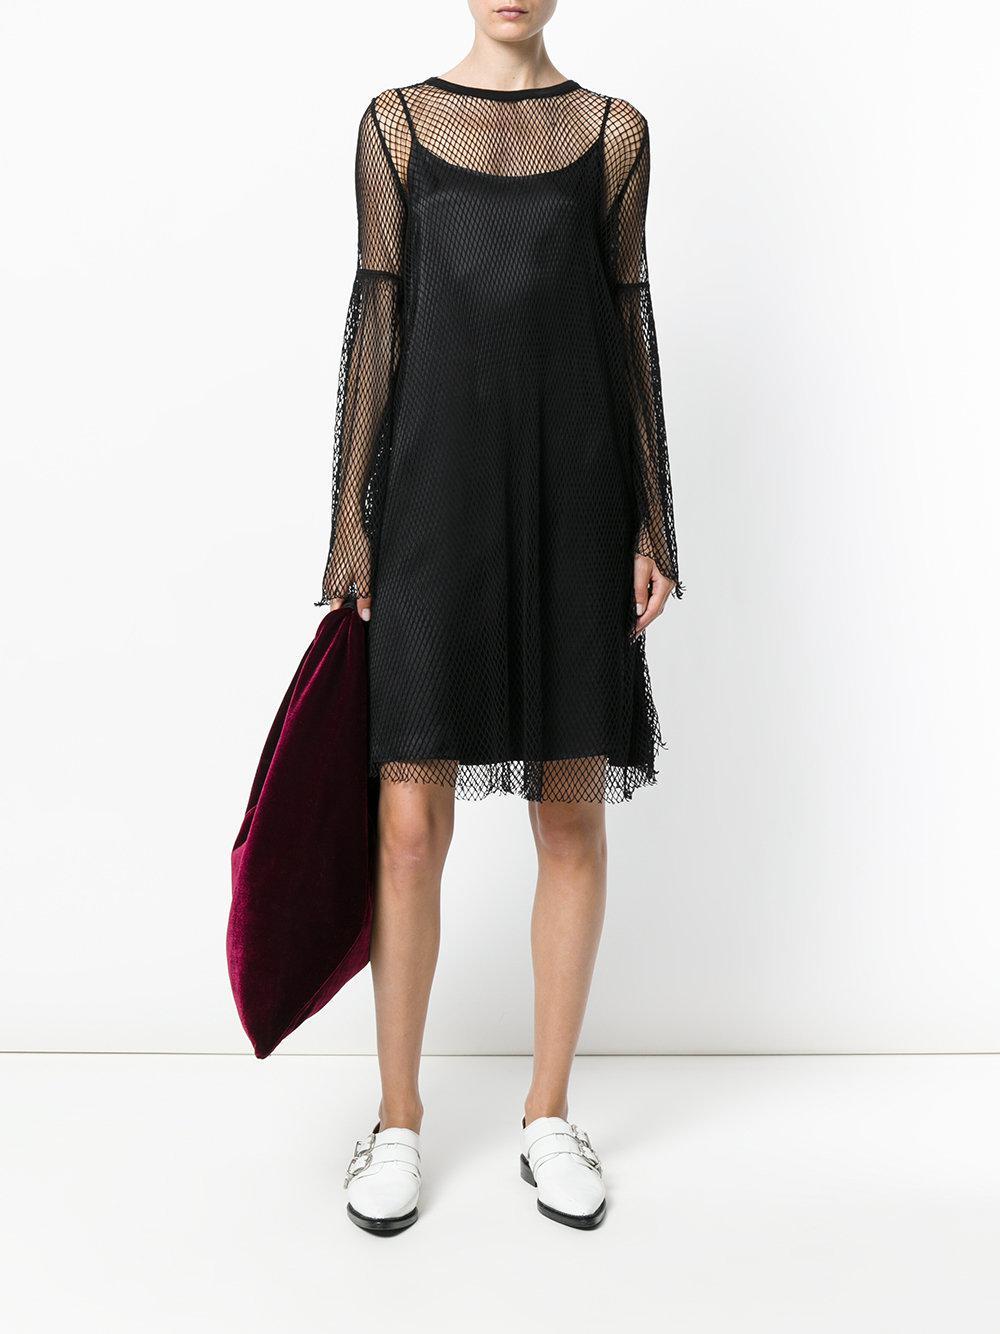 Black Mesh Dress Maison Martin Margiela DLaHV